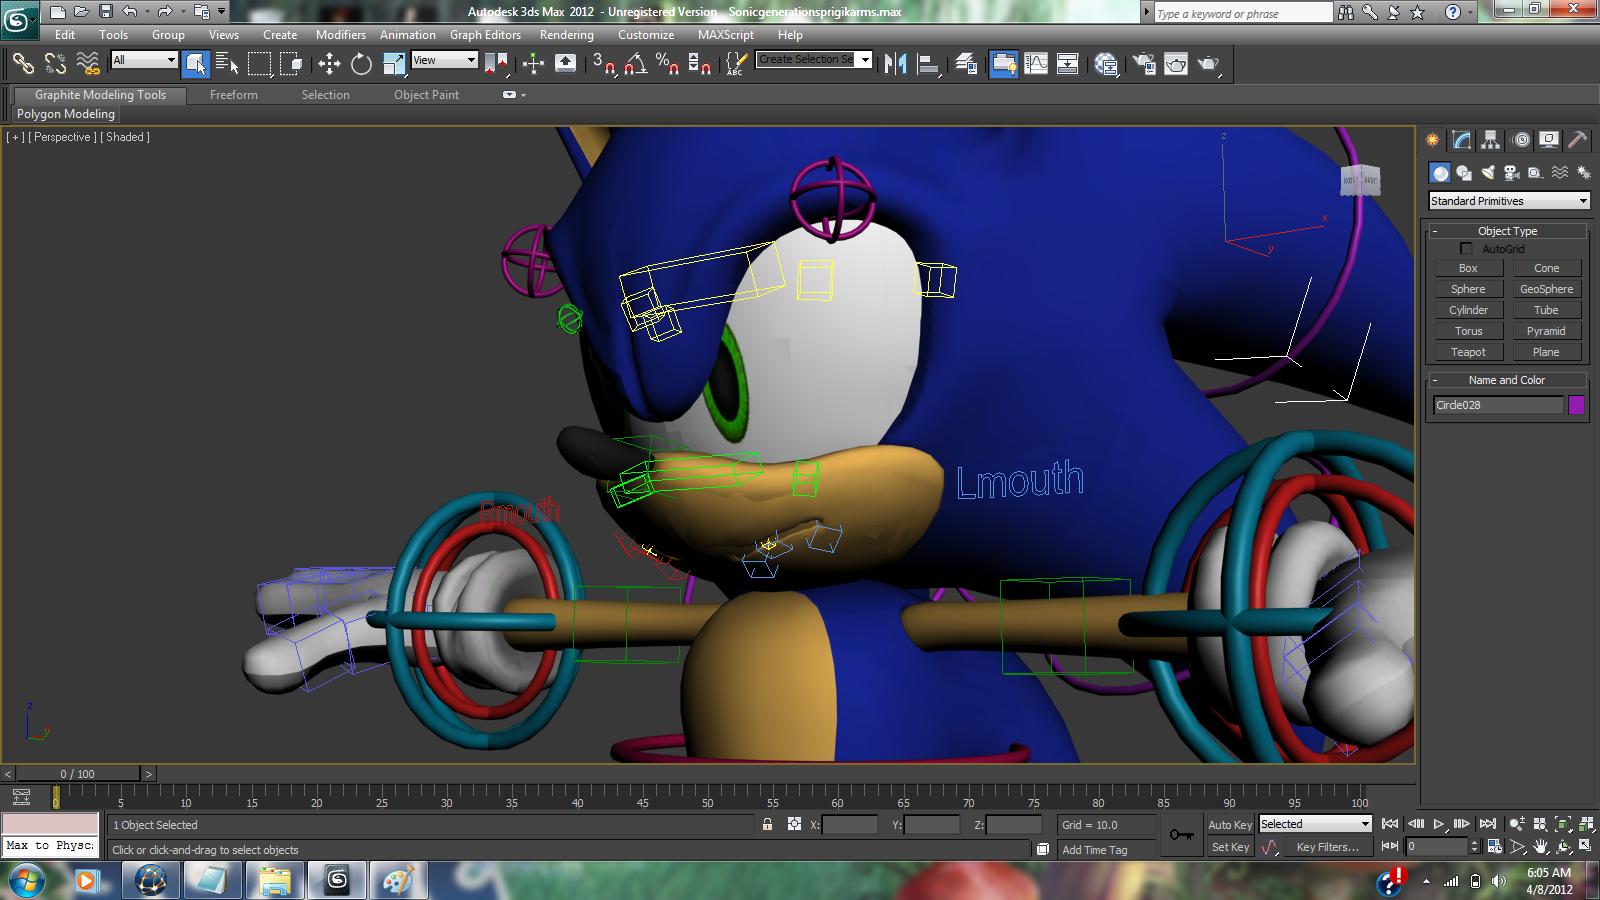 Sonic 3d Model Image Mod Db